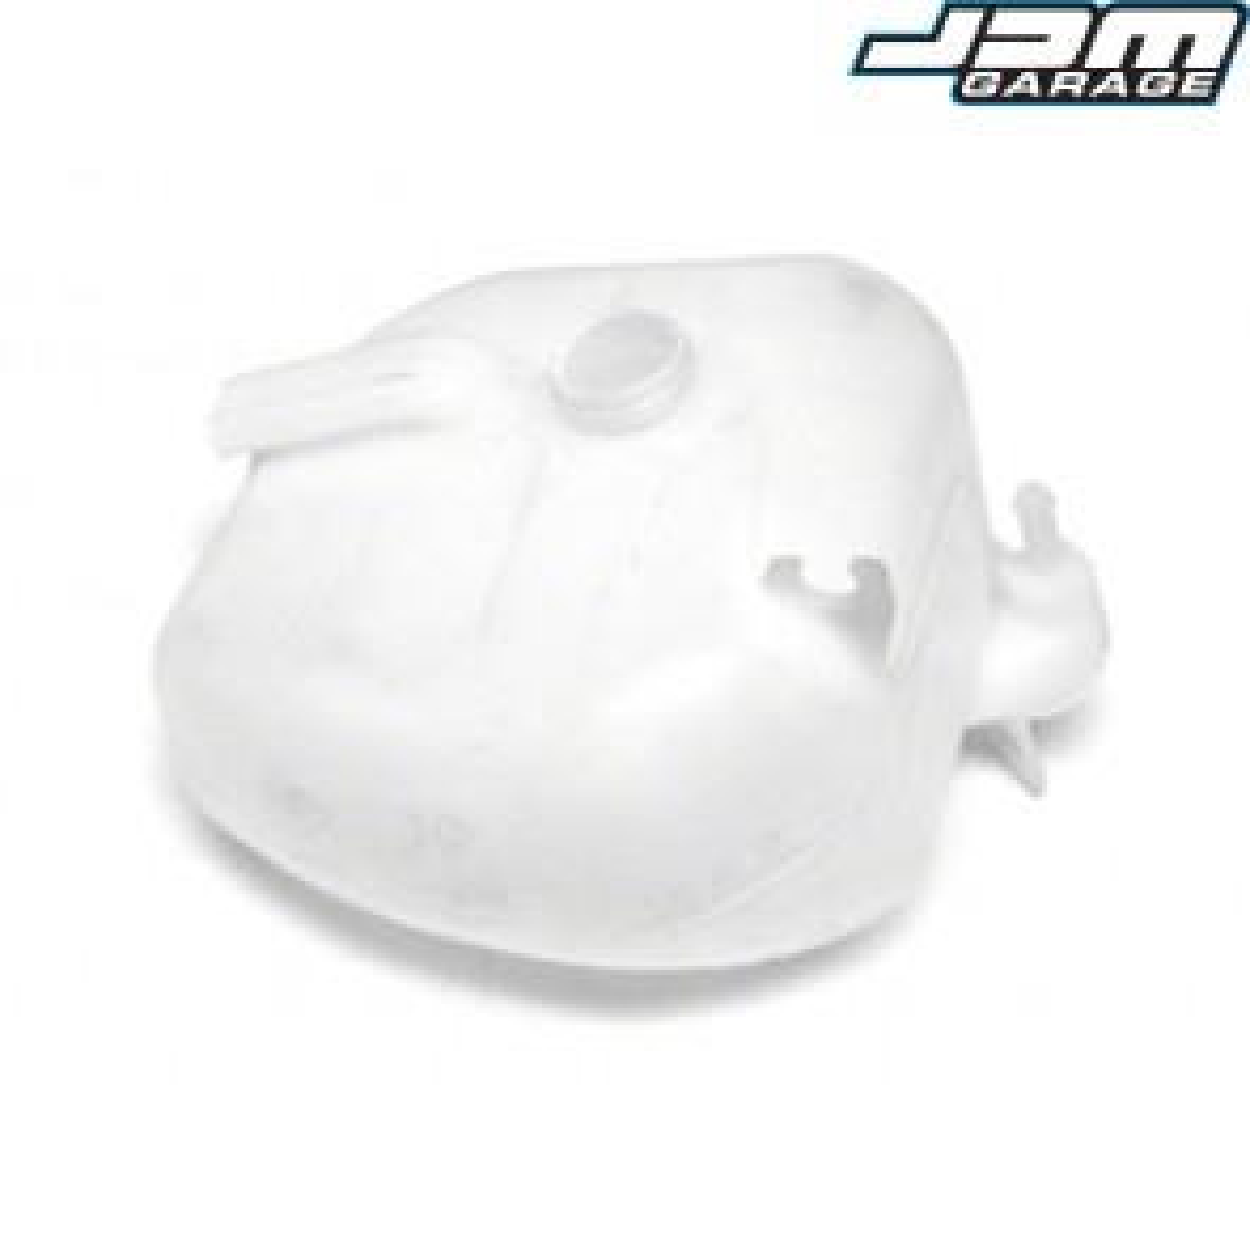 Nissan Genuine OEM Coolant Reservoir Overflow Tank 21721-35F01 S13 200SX